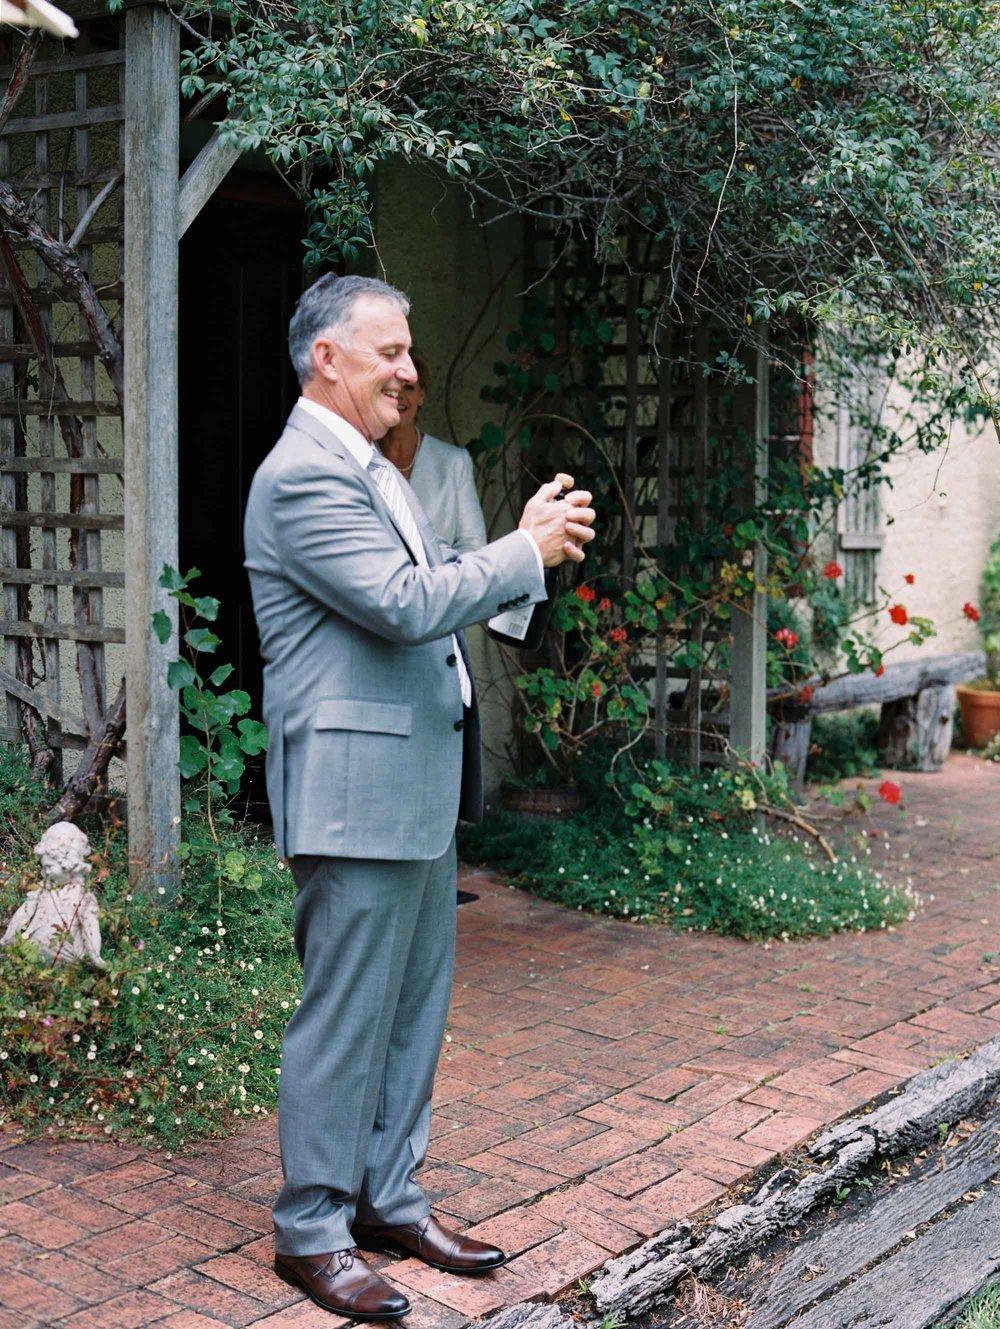 Golding-Wines-wedding-photography-021.jpg